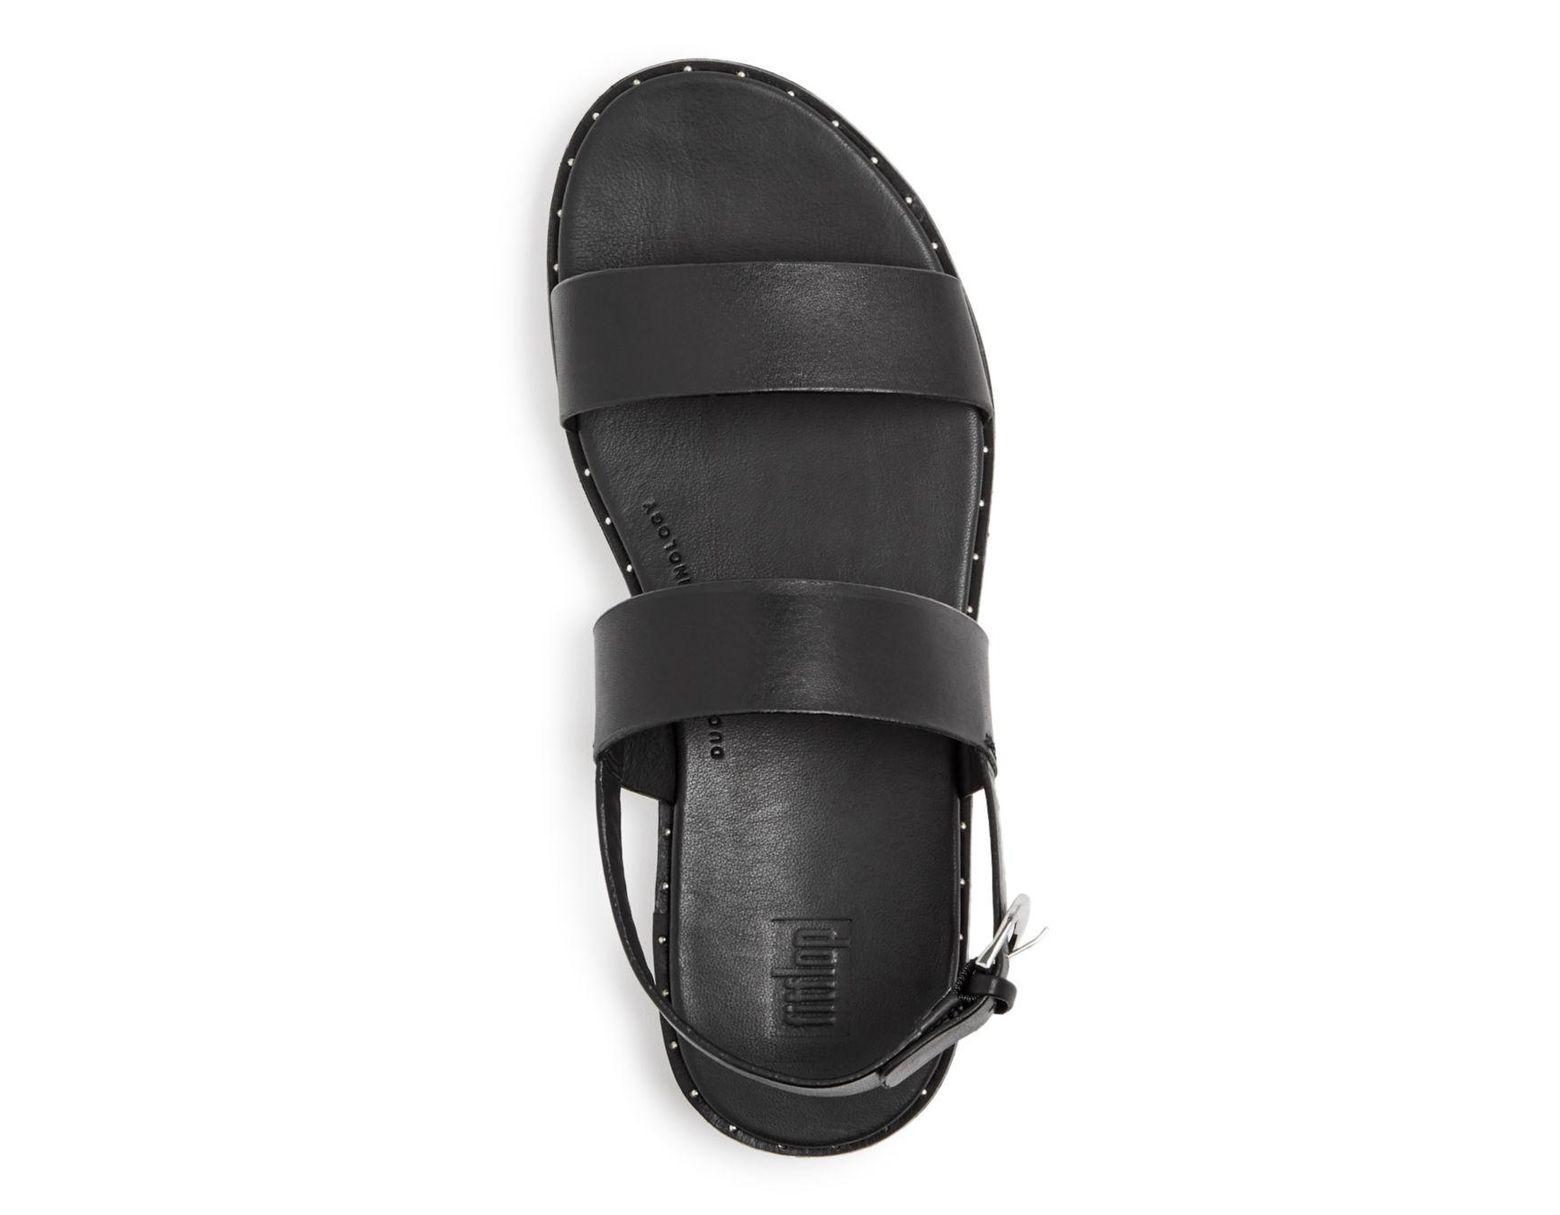 brand new 35cd7 d8d64 Black Women's Barra Ankle Strap Sandals